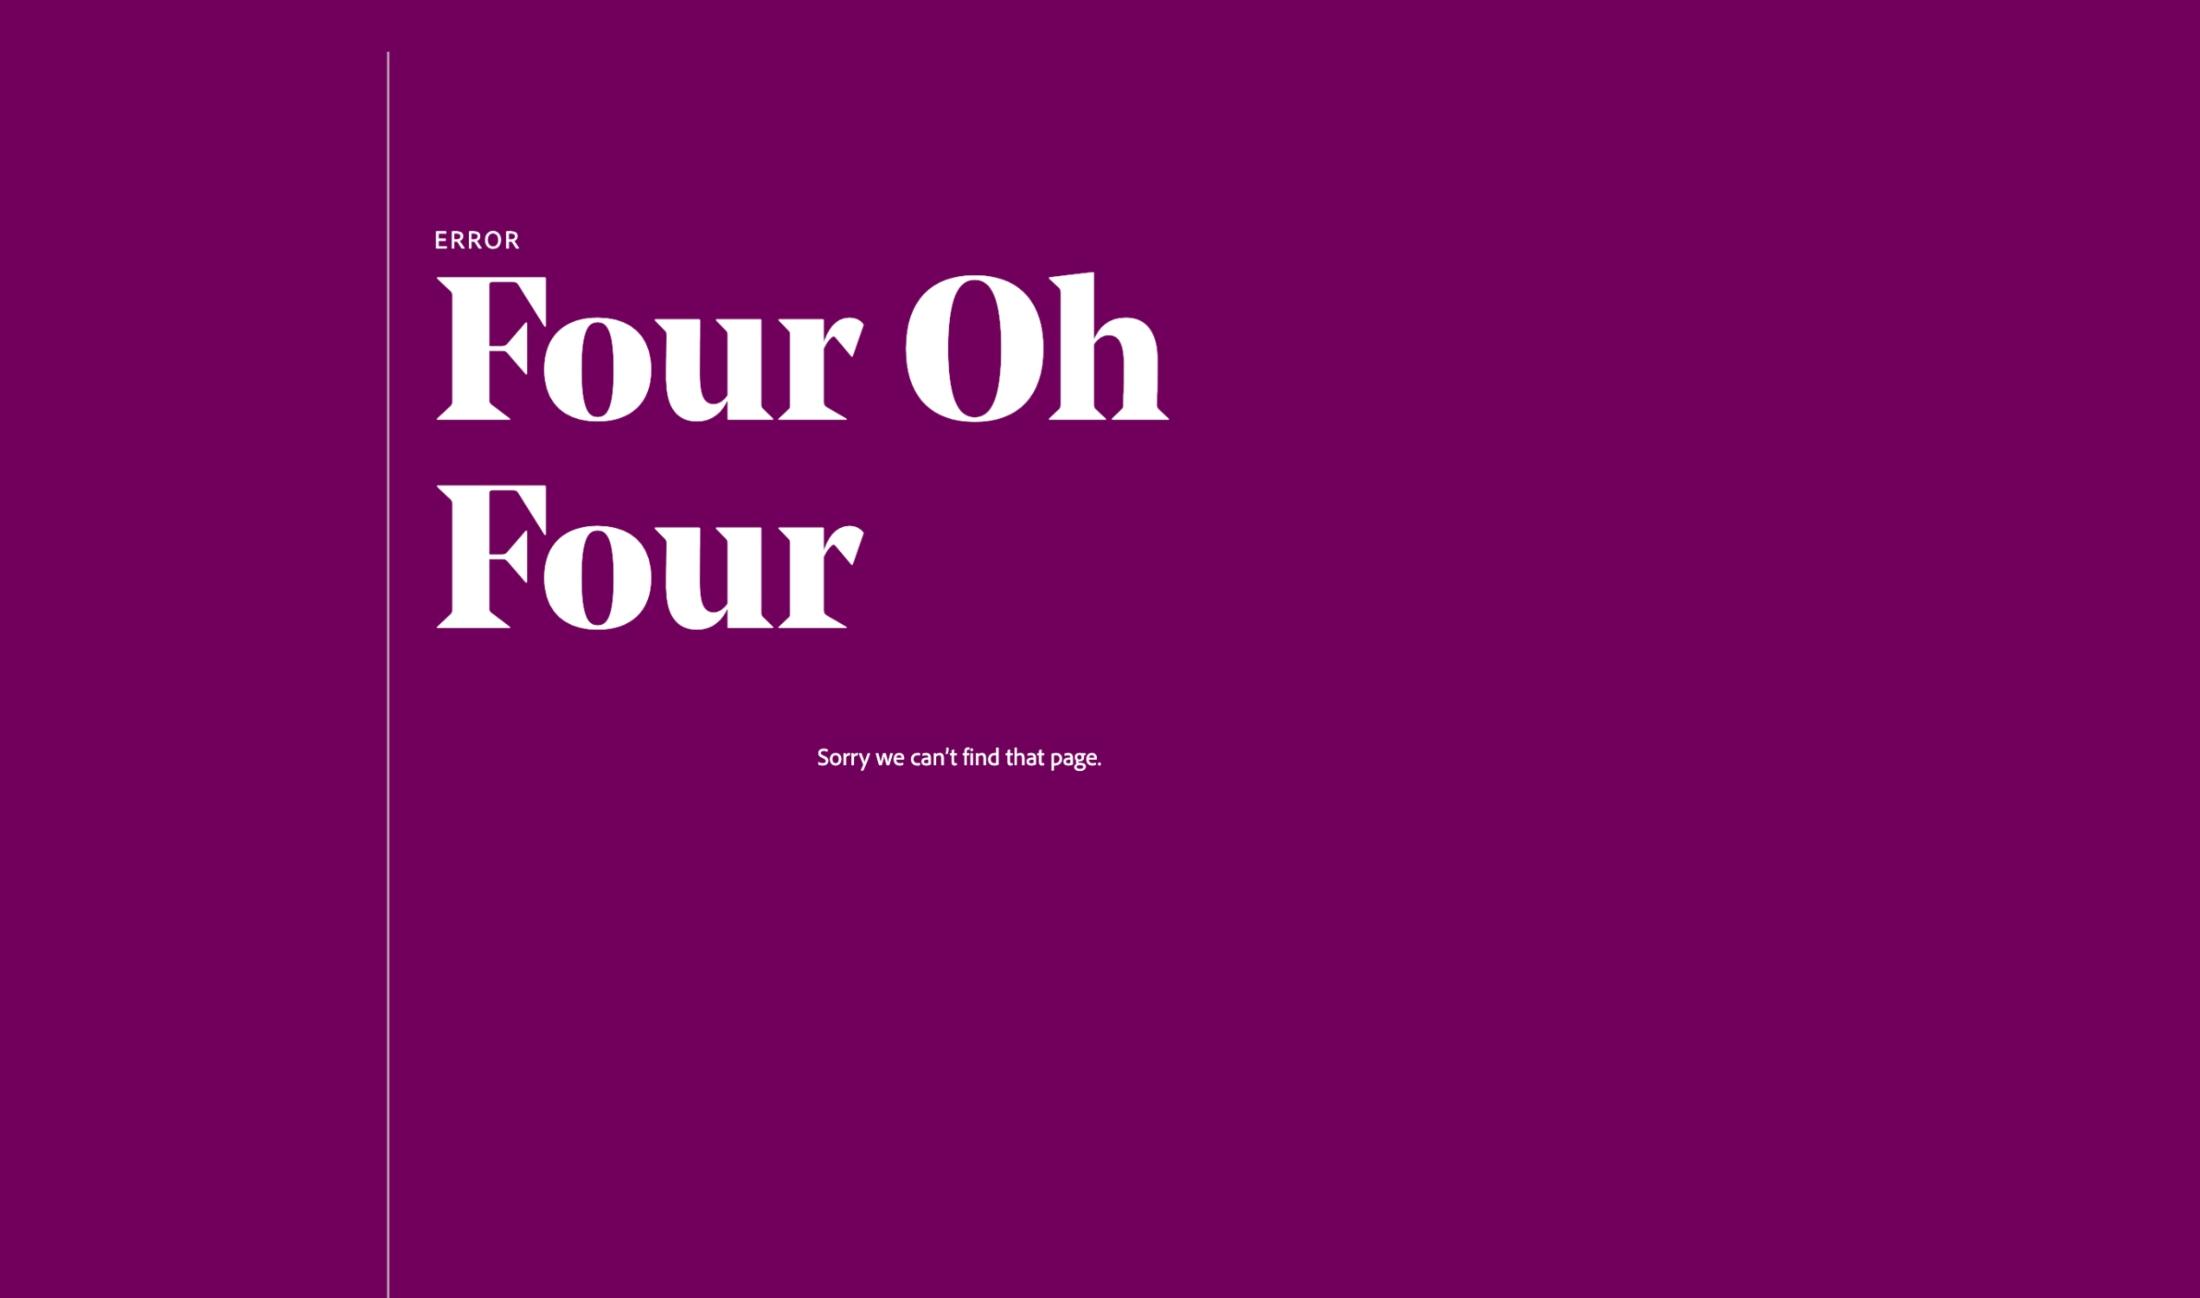 Adobe XD 404 Page